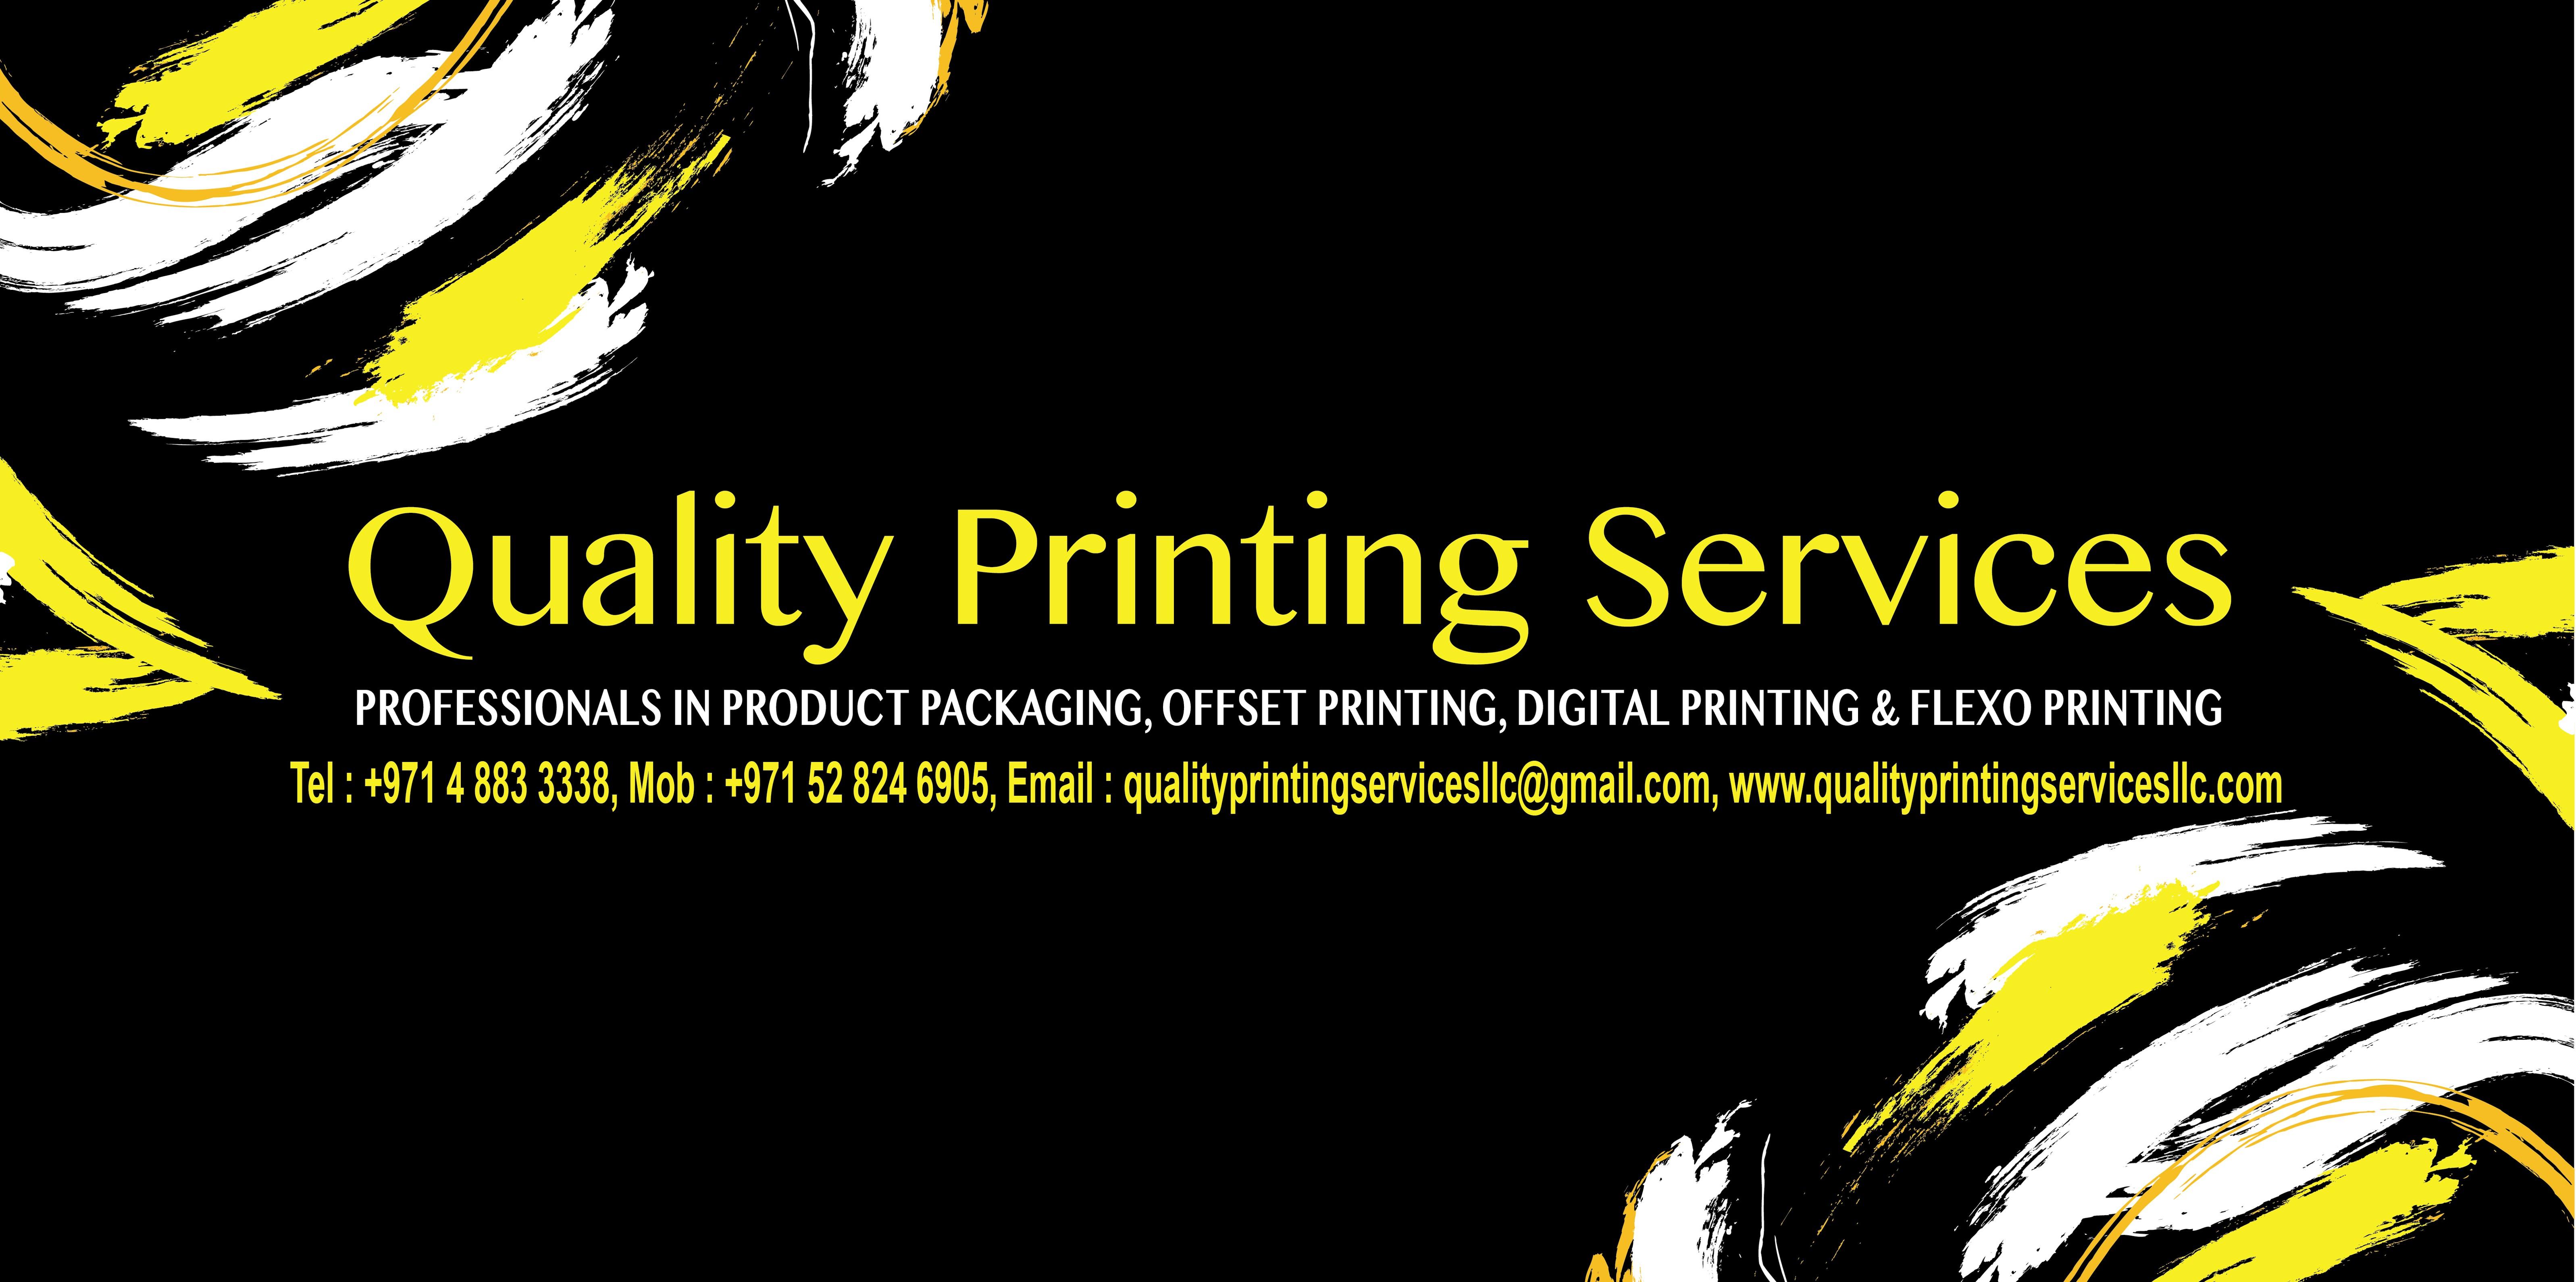 QUALITY PRINTING SERVICES LLC   LinkedIn